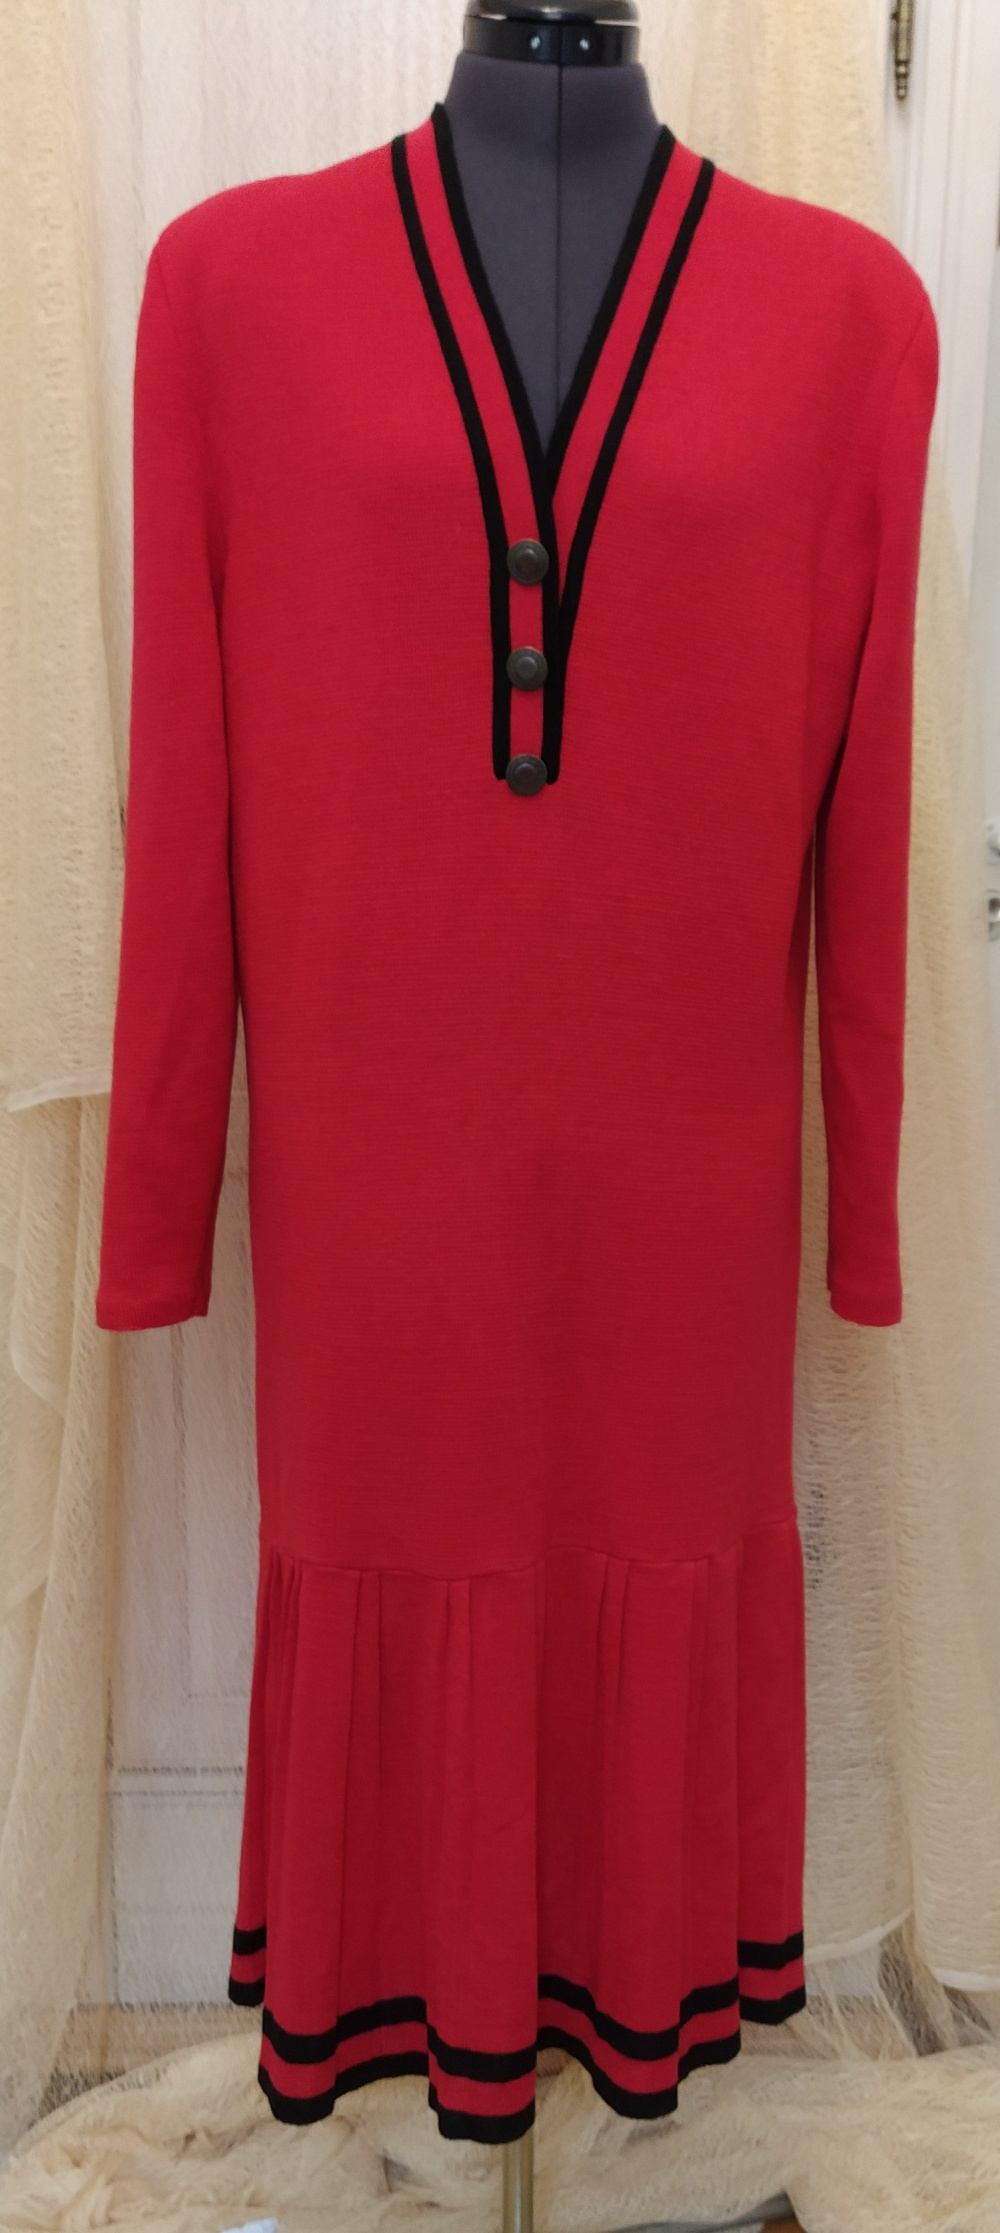 Платье Lianfa Series Wool Fabric, XL,plus size.